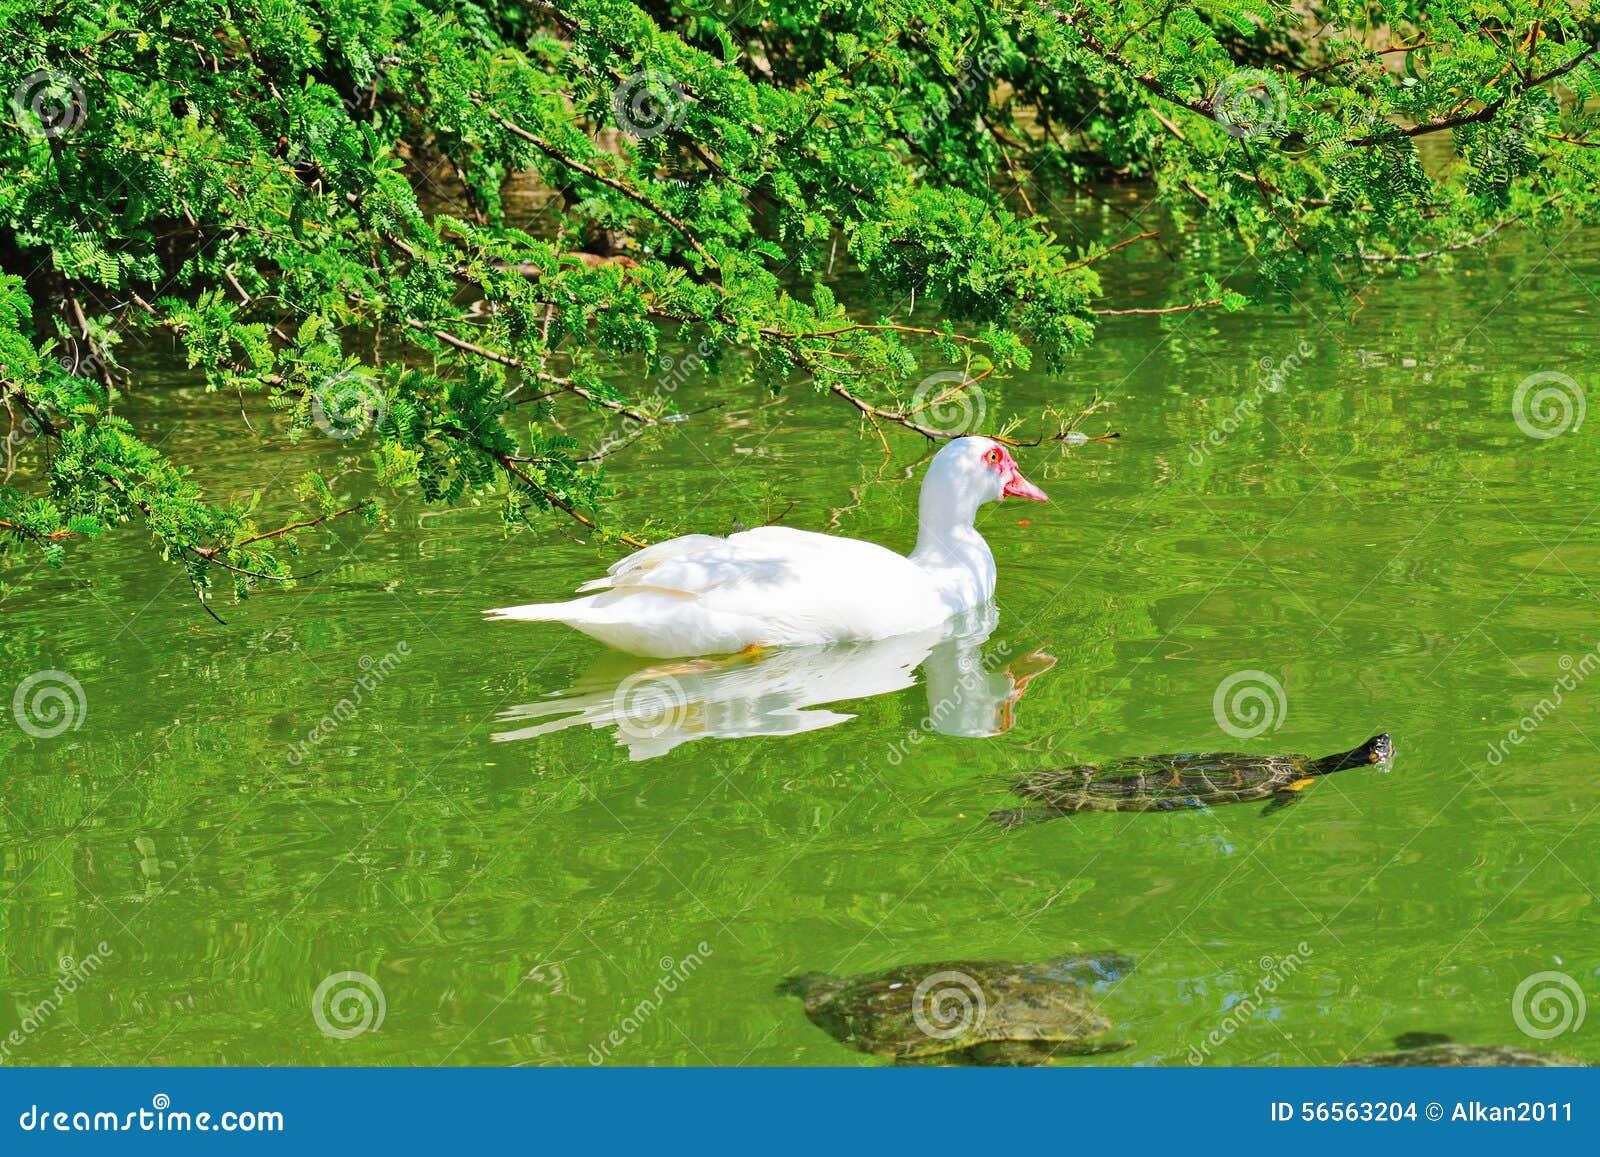 Download Πάπια και χελώνες σε μια πράσινη λίμνη Στοκ Εικόνες - εικόνα από muscovy, χελώνες: 56563204